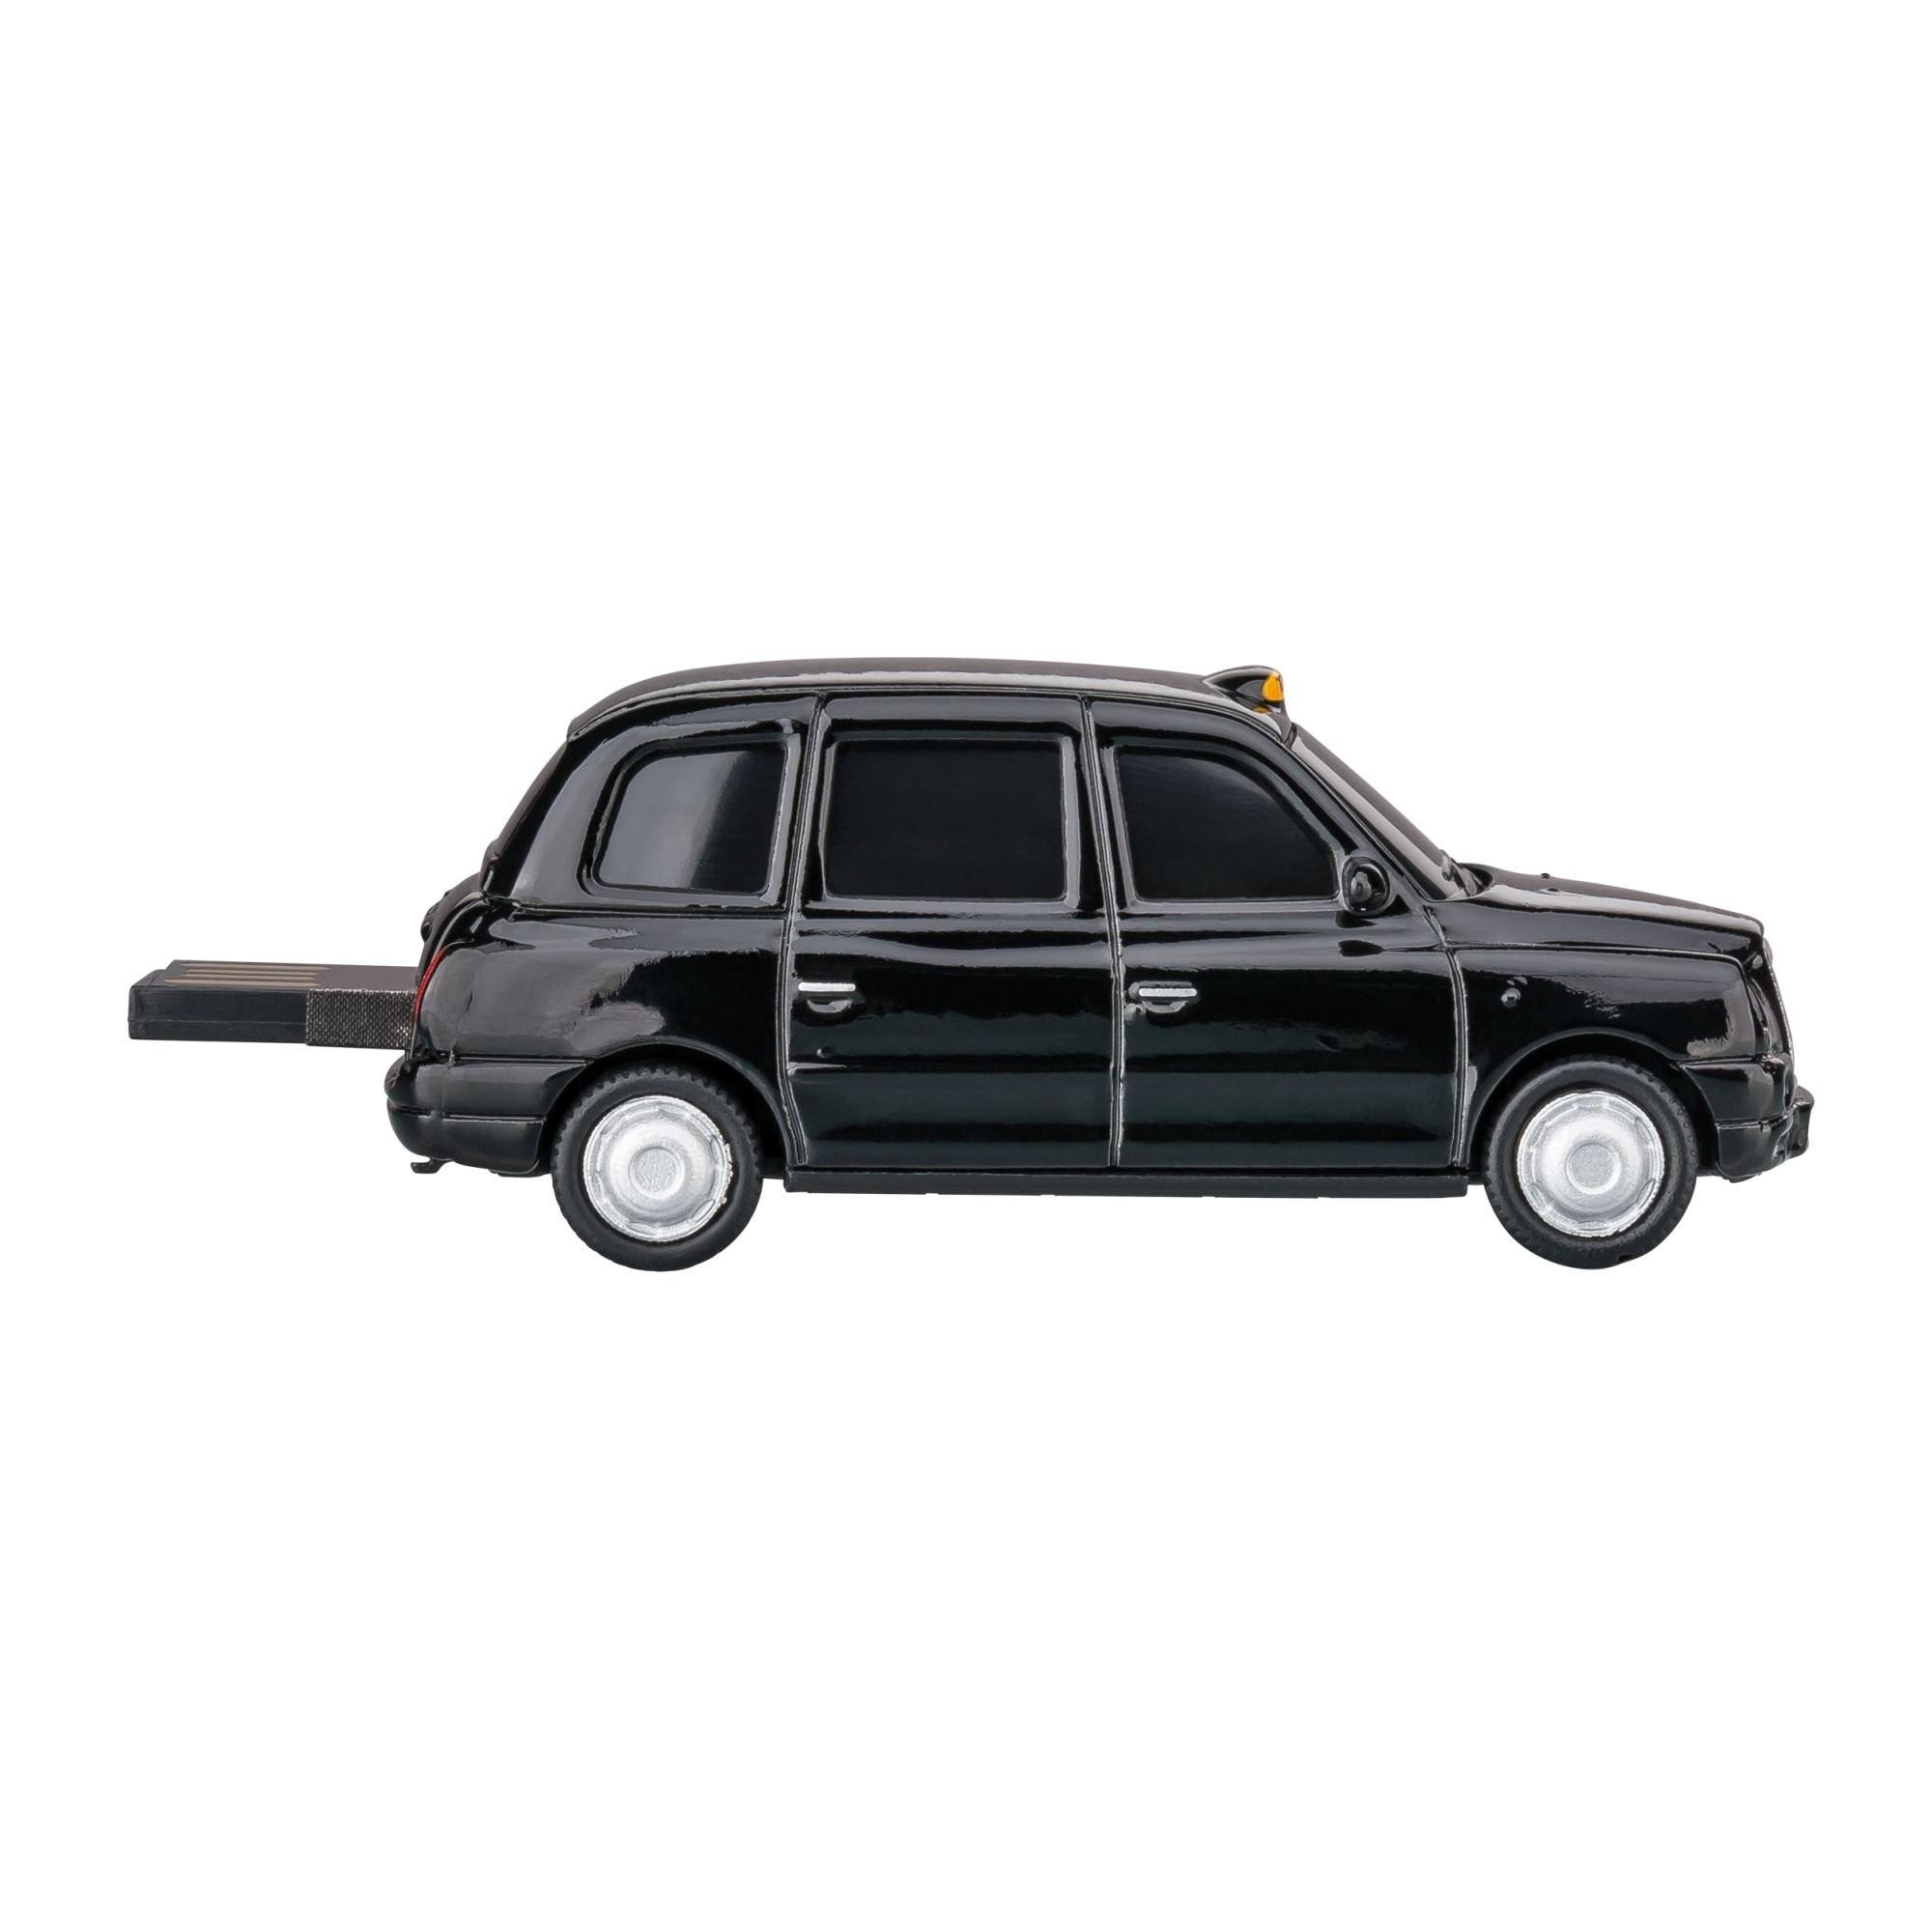 USB-Speicherstick London Taxi TX4 1:72 BLACK 16GB, Ansicht 5